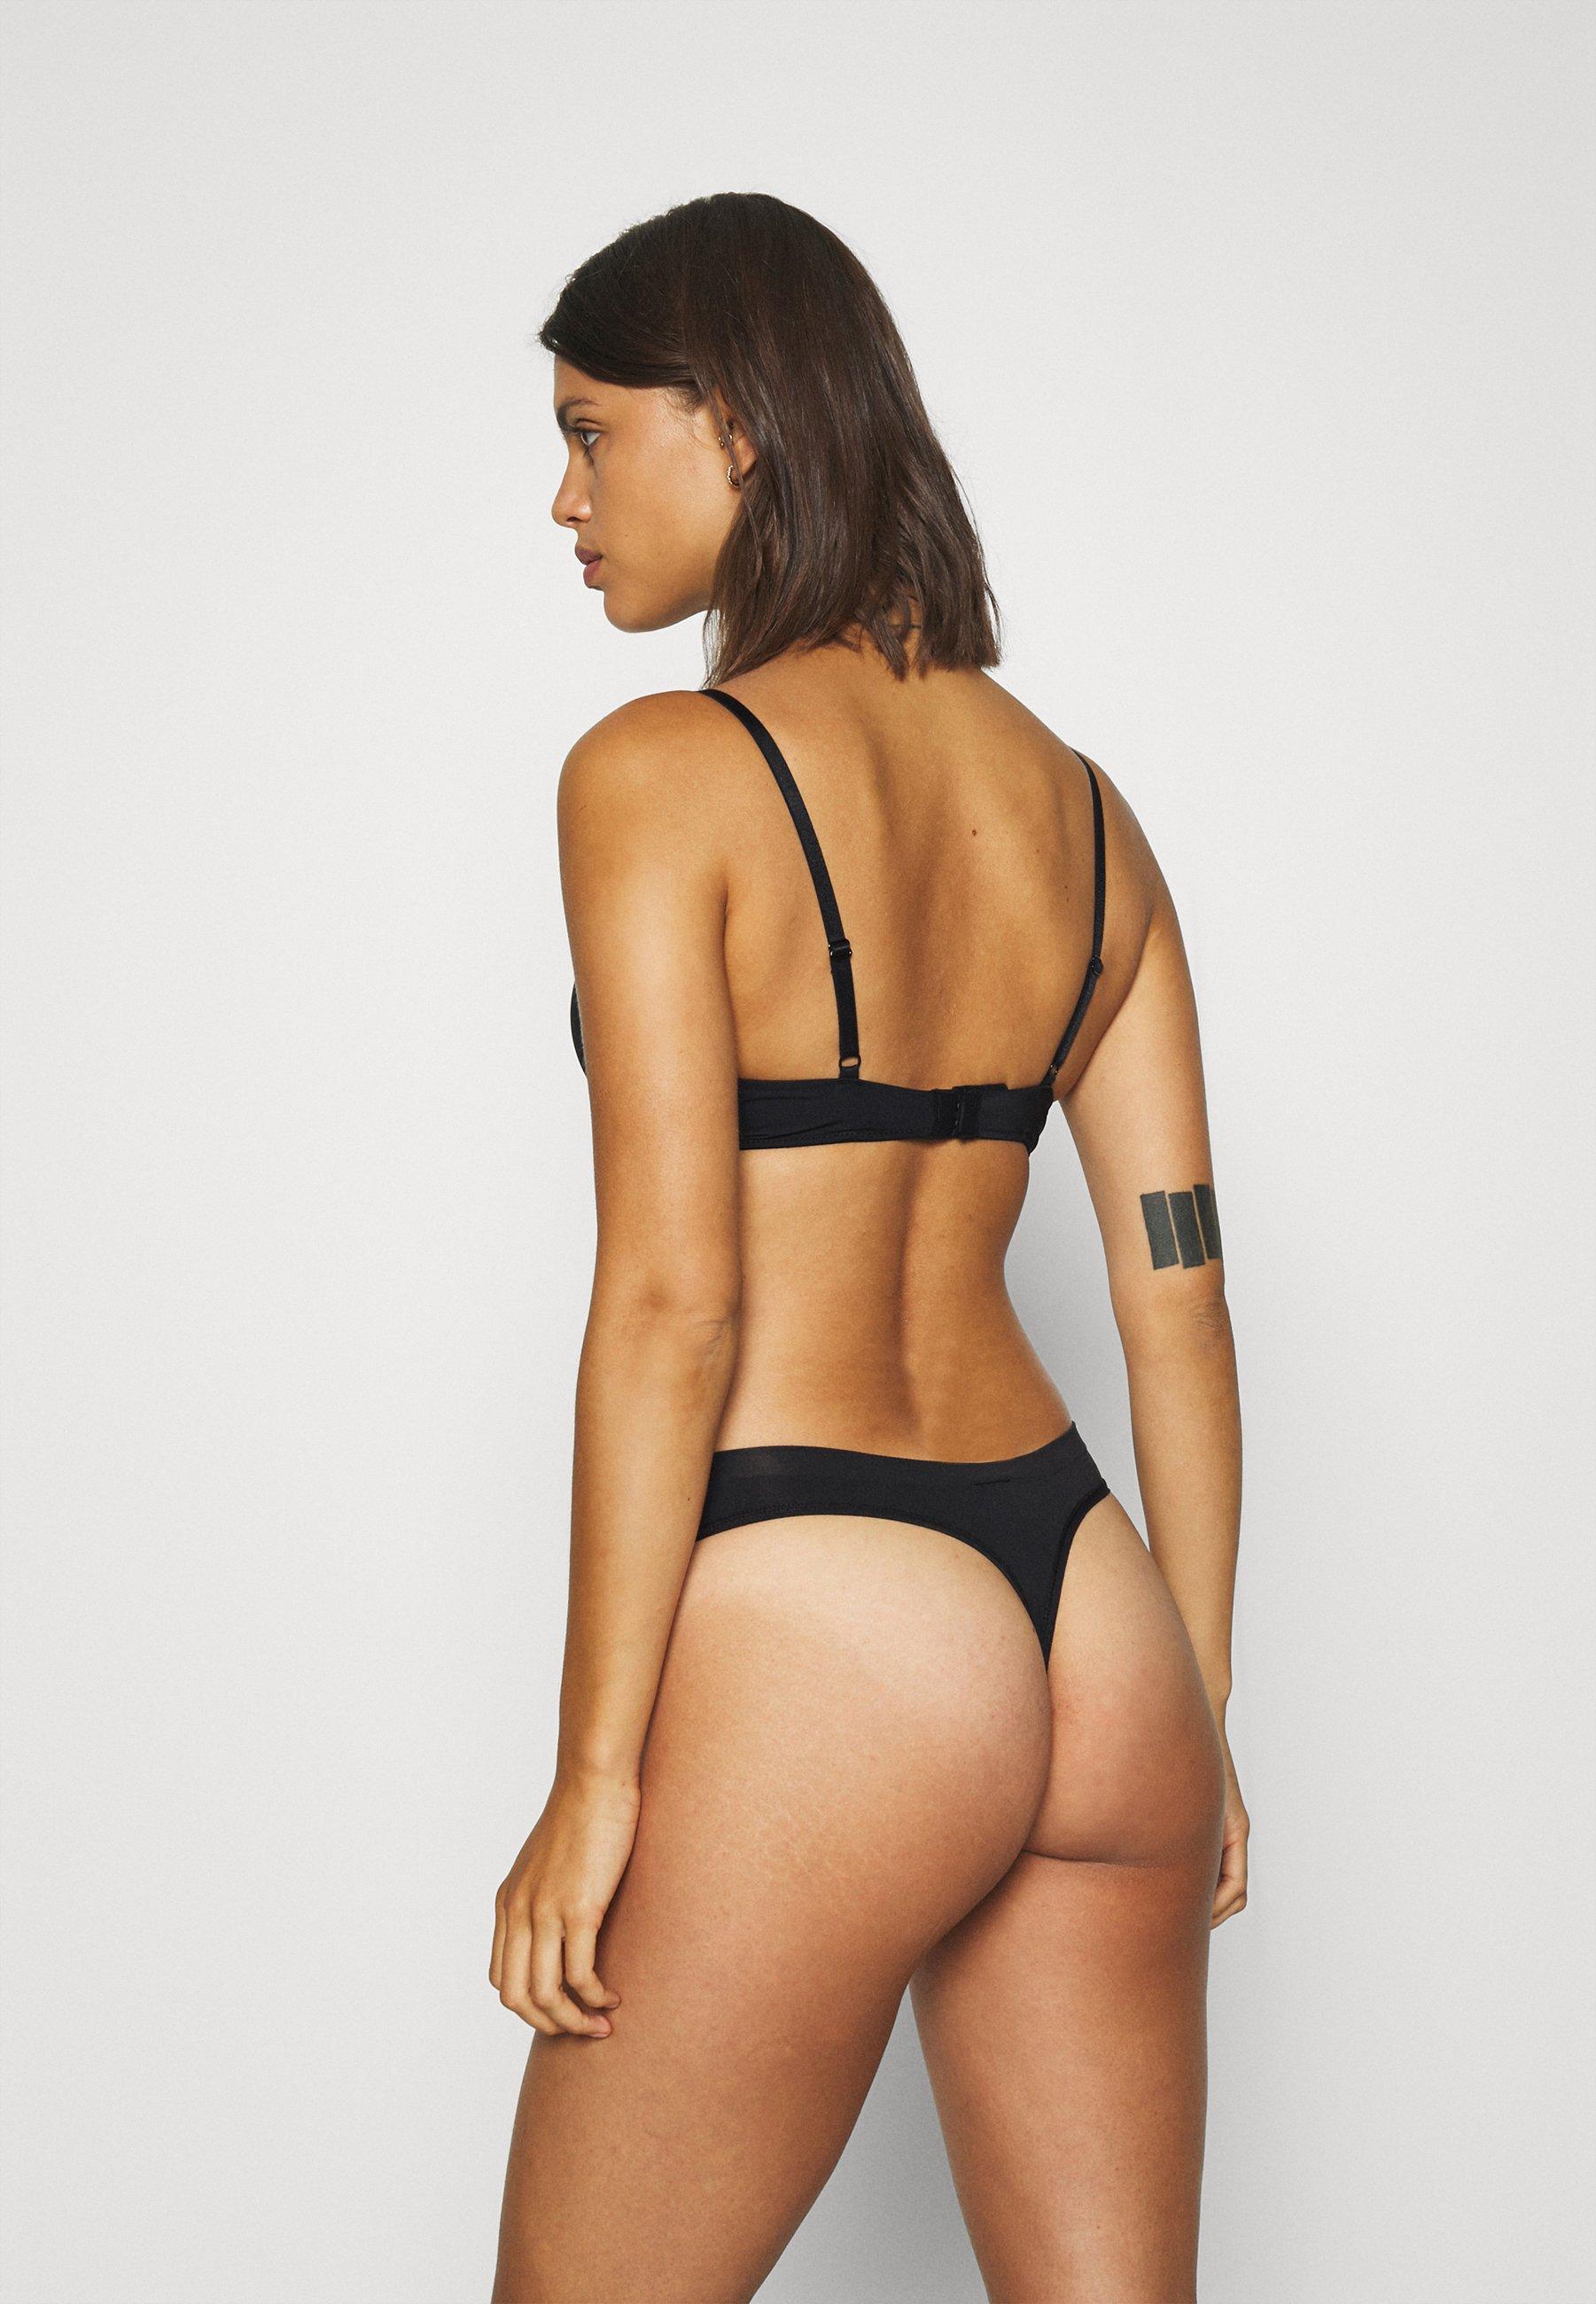 Women Essential Thong - 3 Pack  - Thong